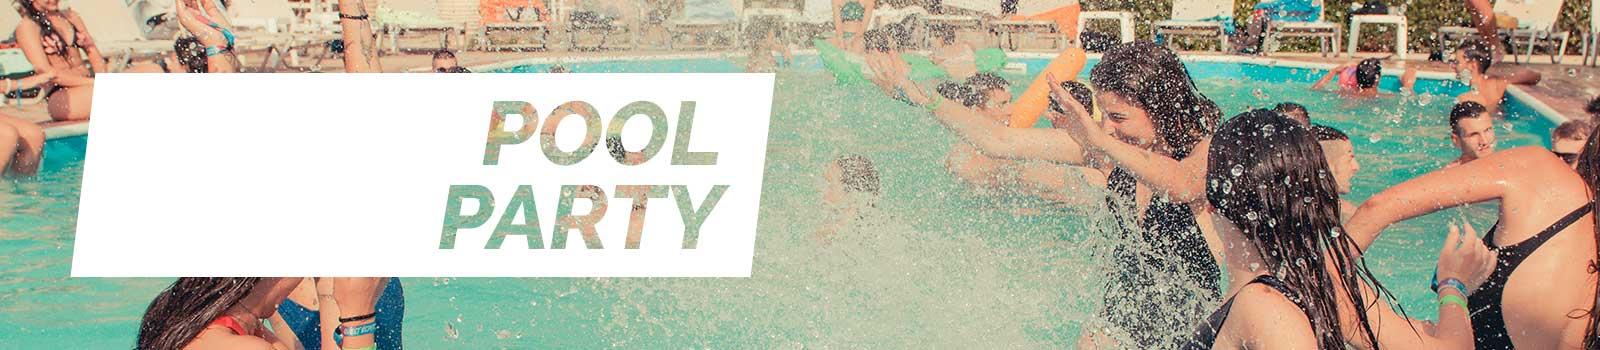 corfu-b6-pool-party